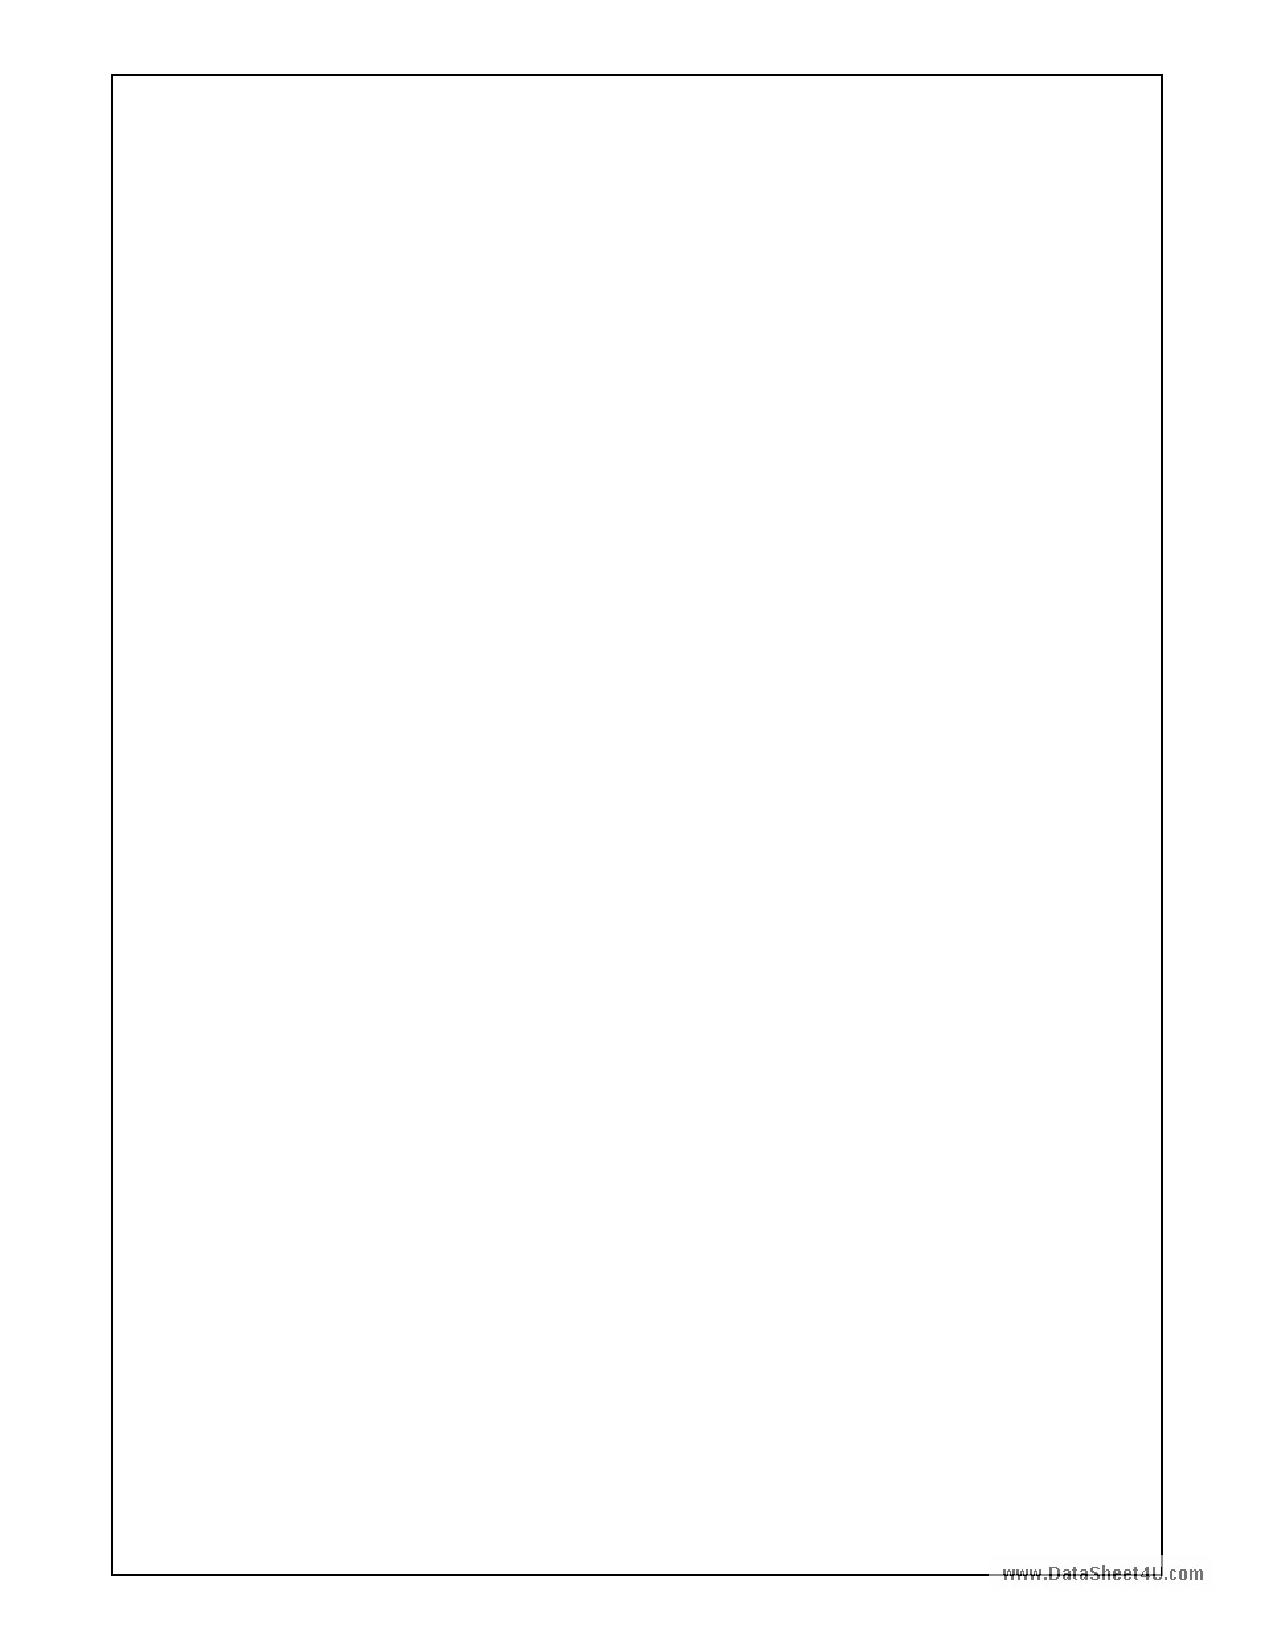 G1-266P-85-1.8 pdf